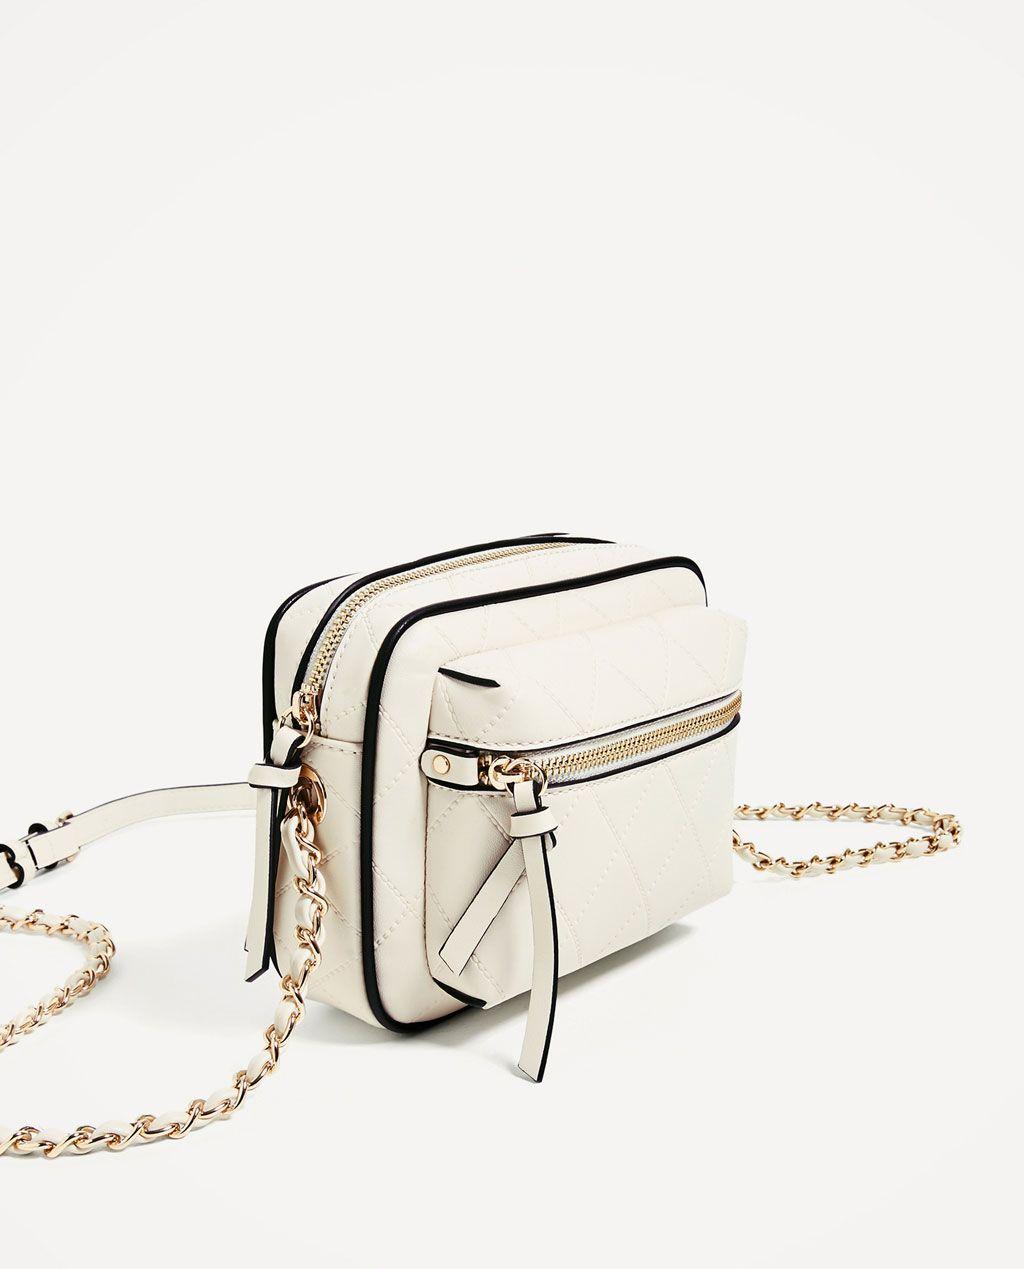 6cf69099c5f7 CROSSBODY BAG WITH POCKET-Crossbody bags-BAGS-WOMAN | ZARA United States